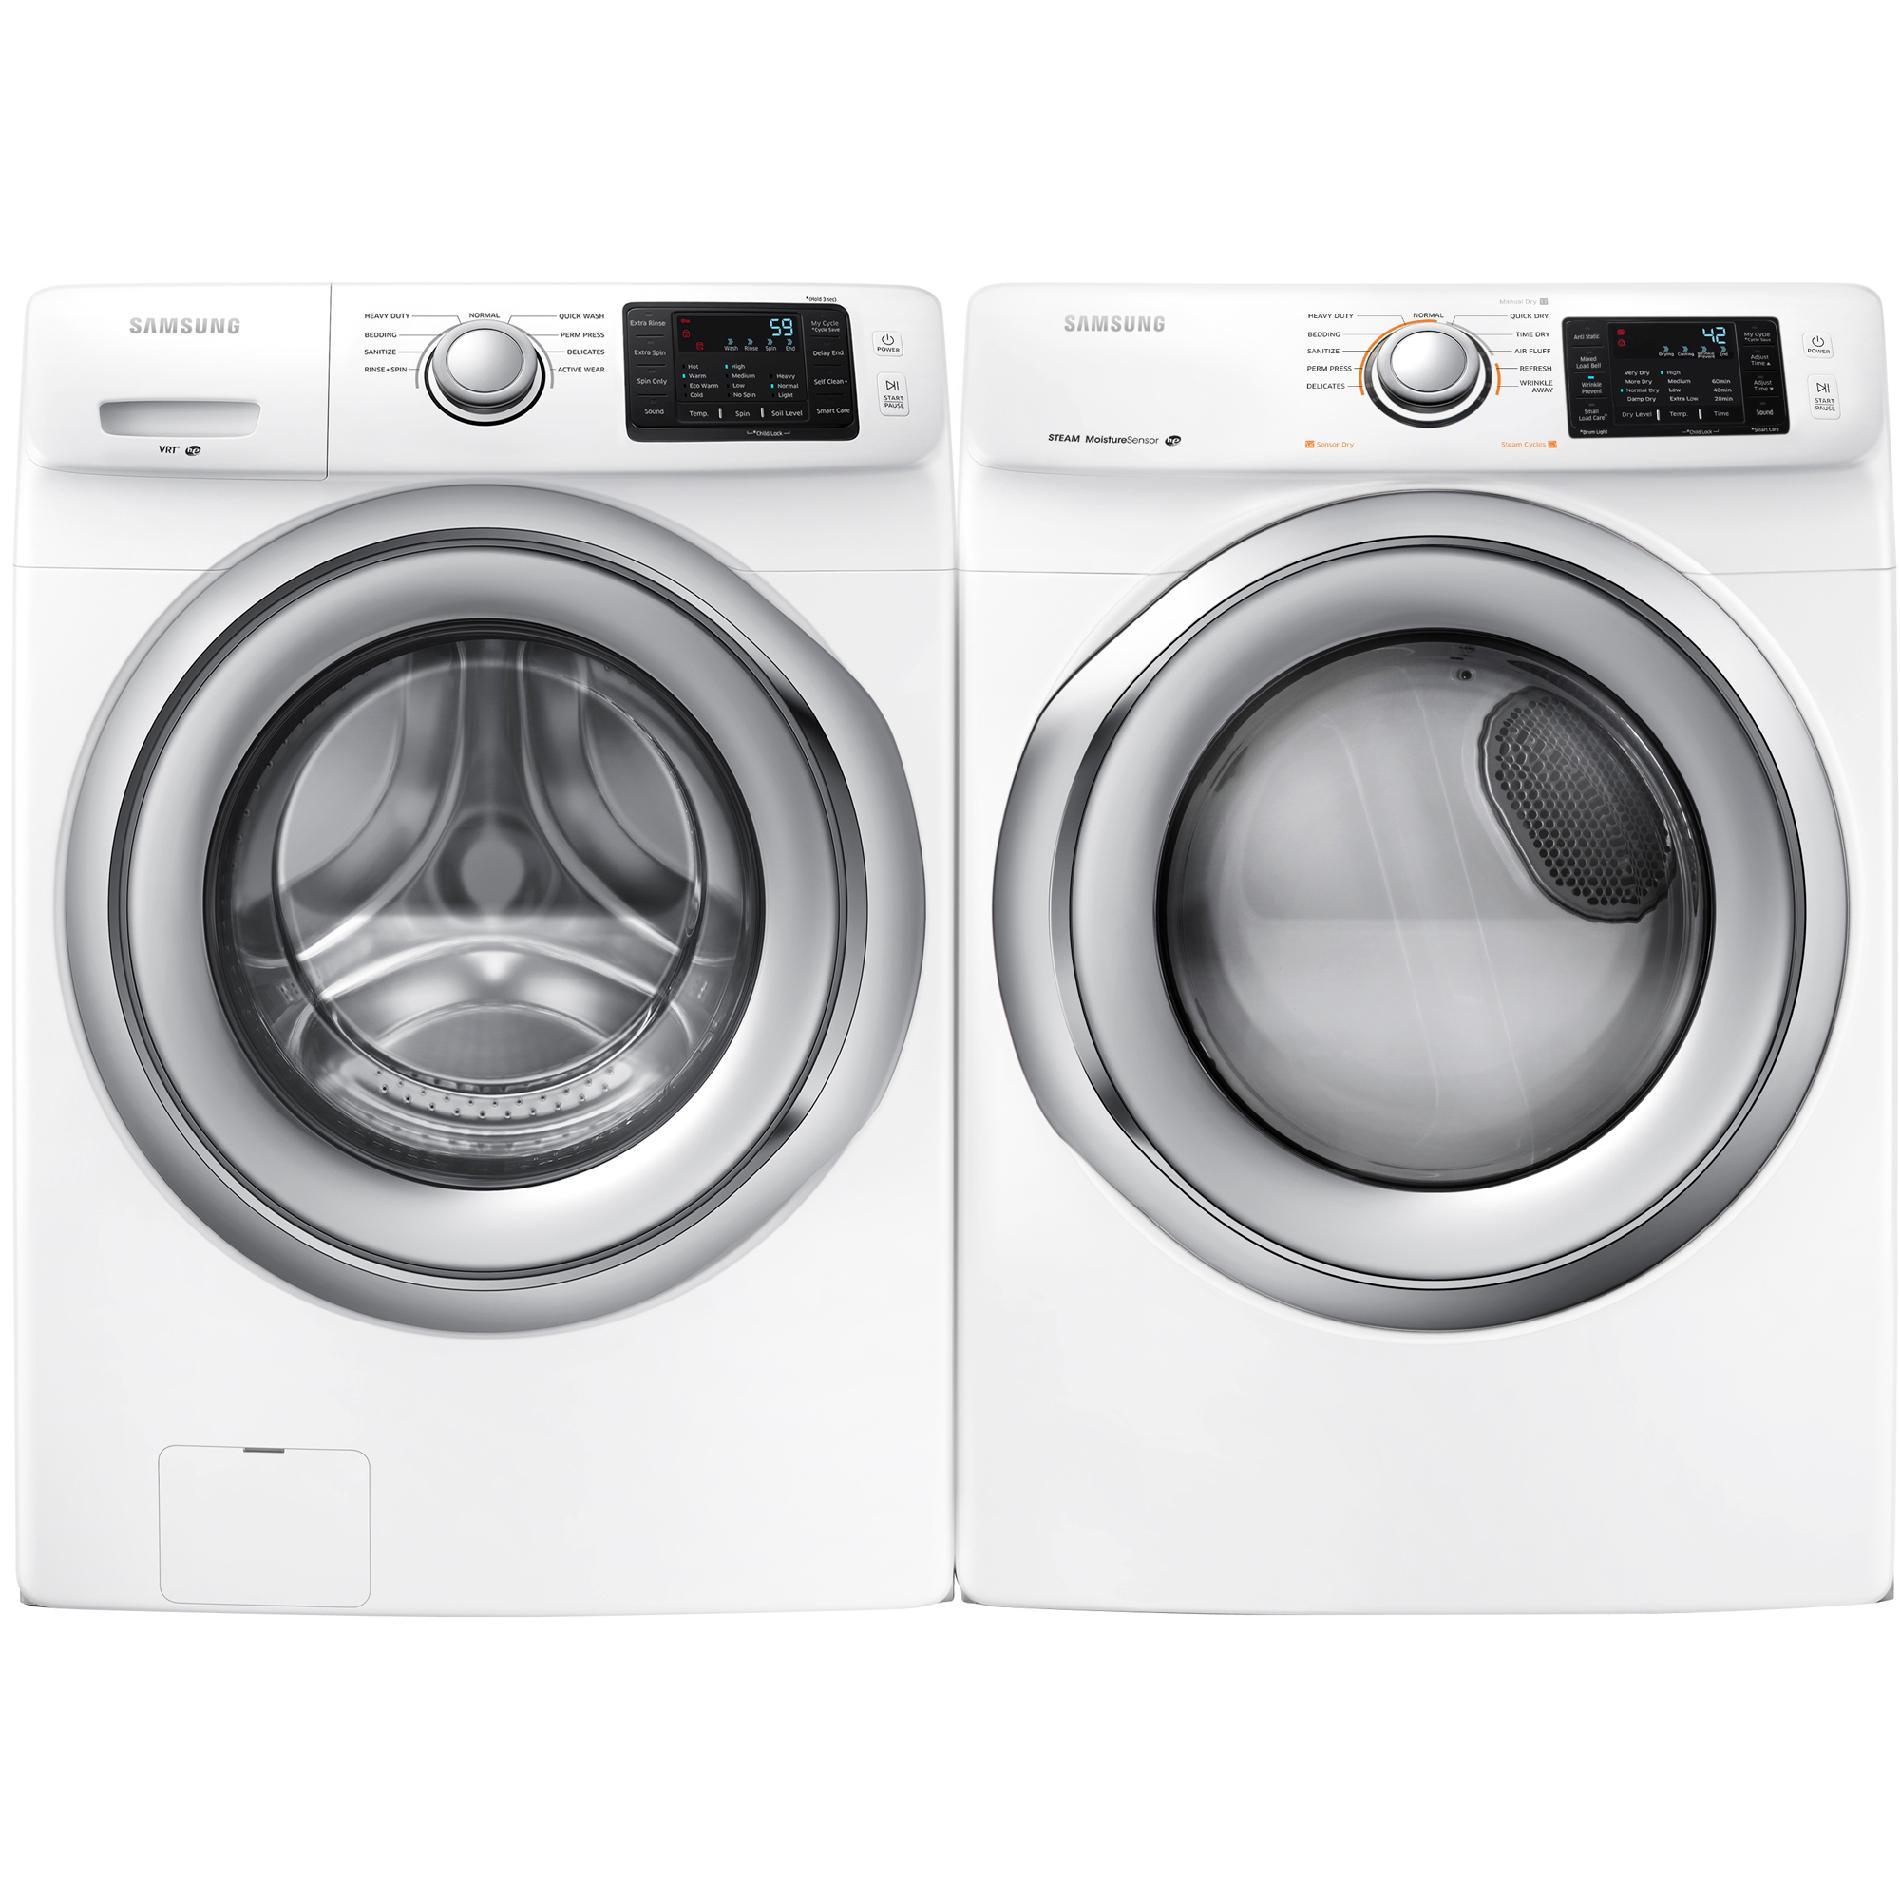 Samsung DV42H5200EW 7.5 cu. ft. Electric Dryer - White